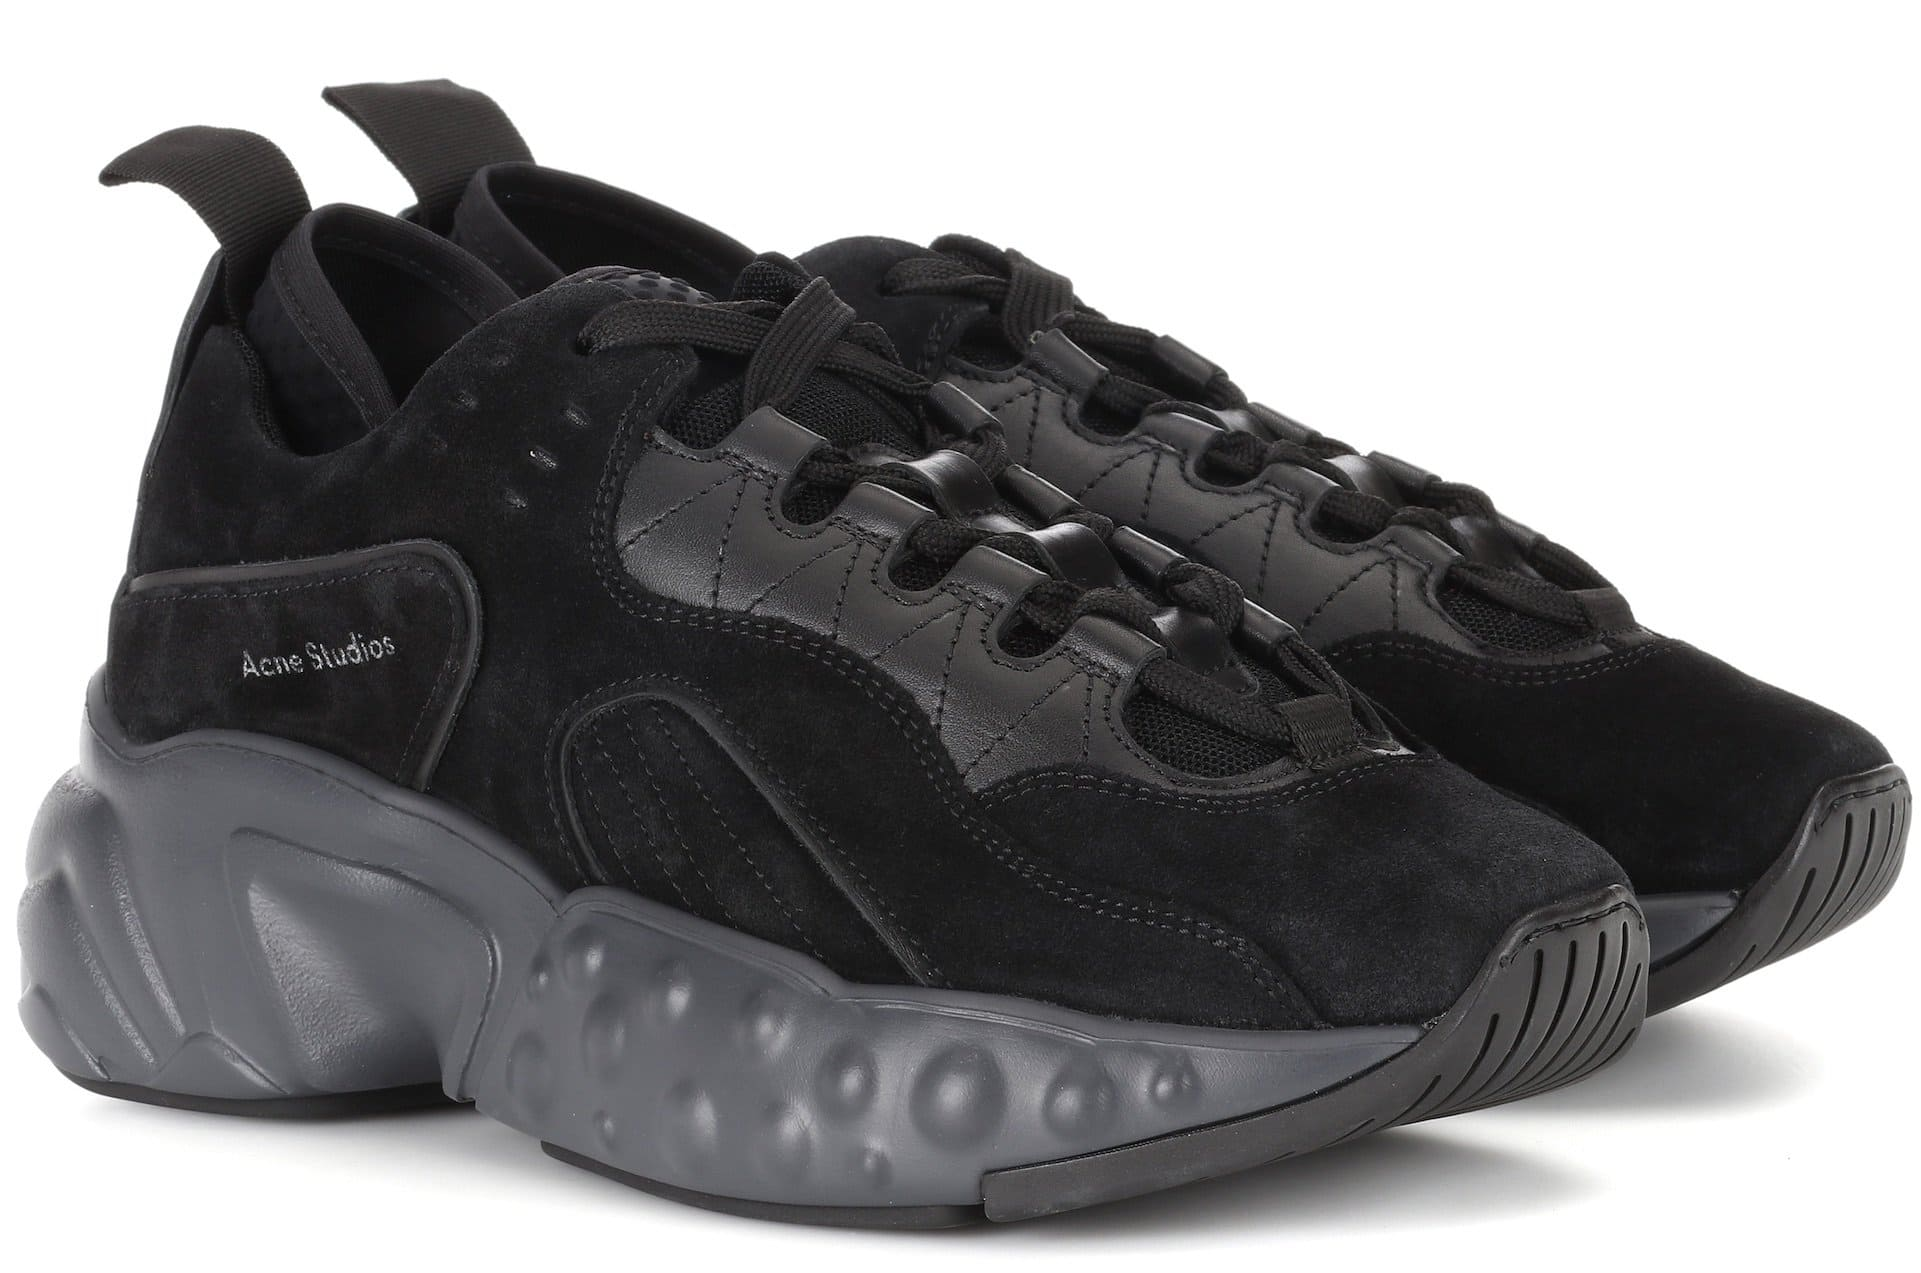 Acne Studios black suede sneakers